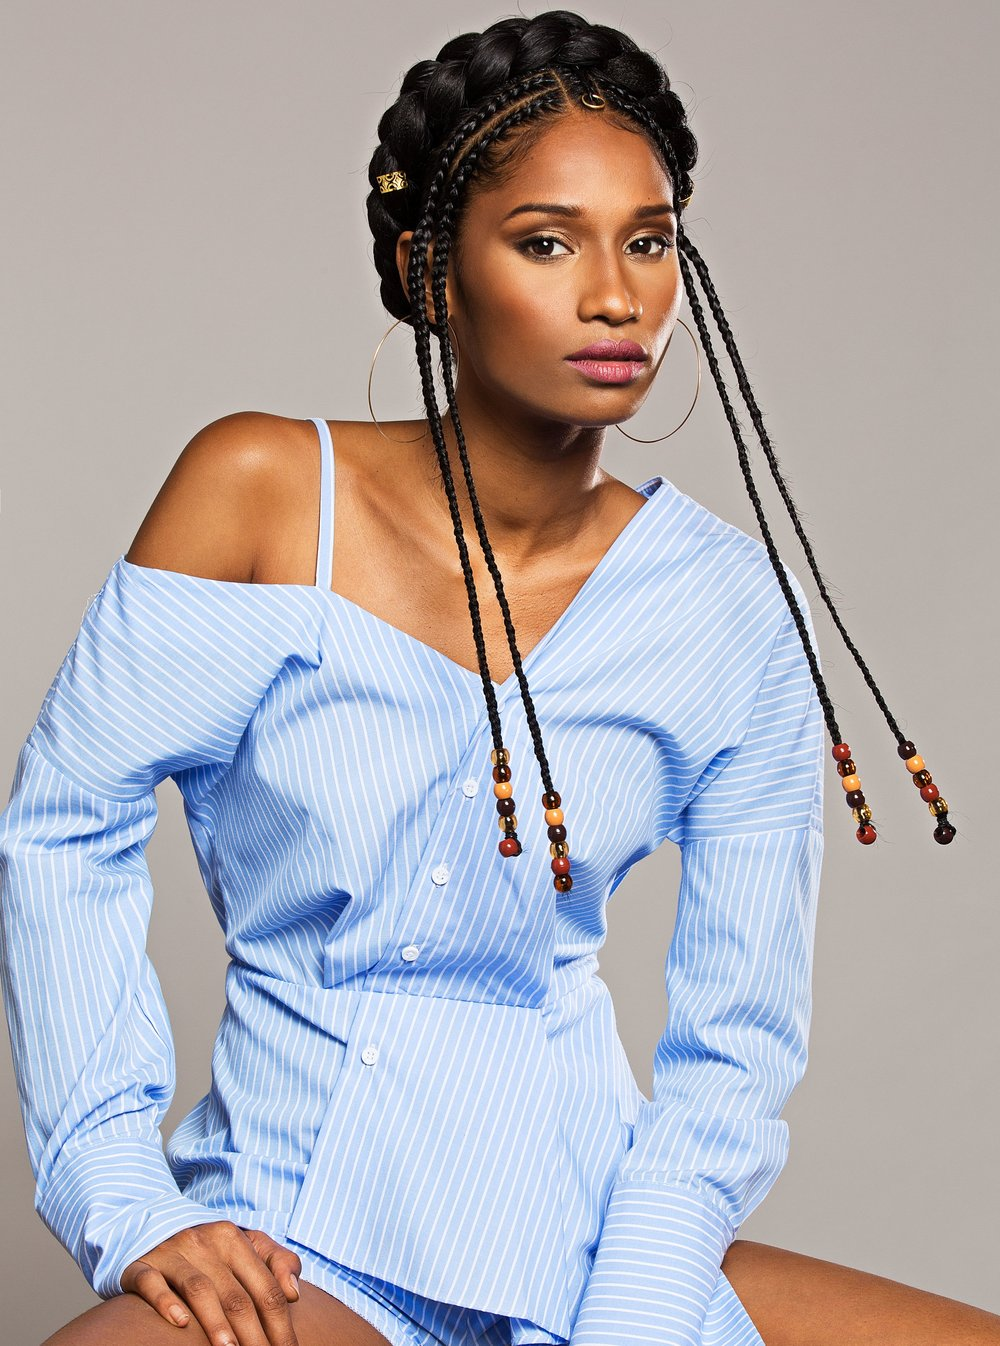 Shoot for Cosmopolitan   Makeup - Makeup By Joh  Photographer - Ruben Chamorro  Model - Renee Bhagwandeen  Hairstylist - Stasha Harris  Styled in Zara